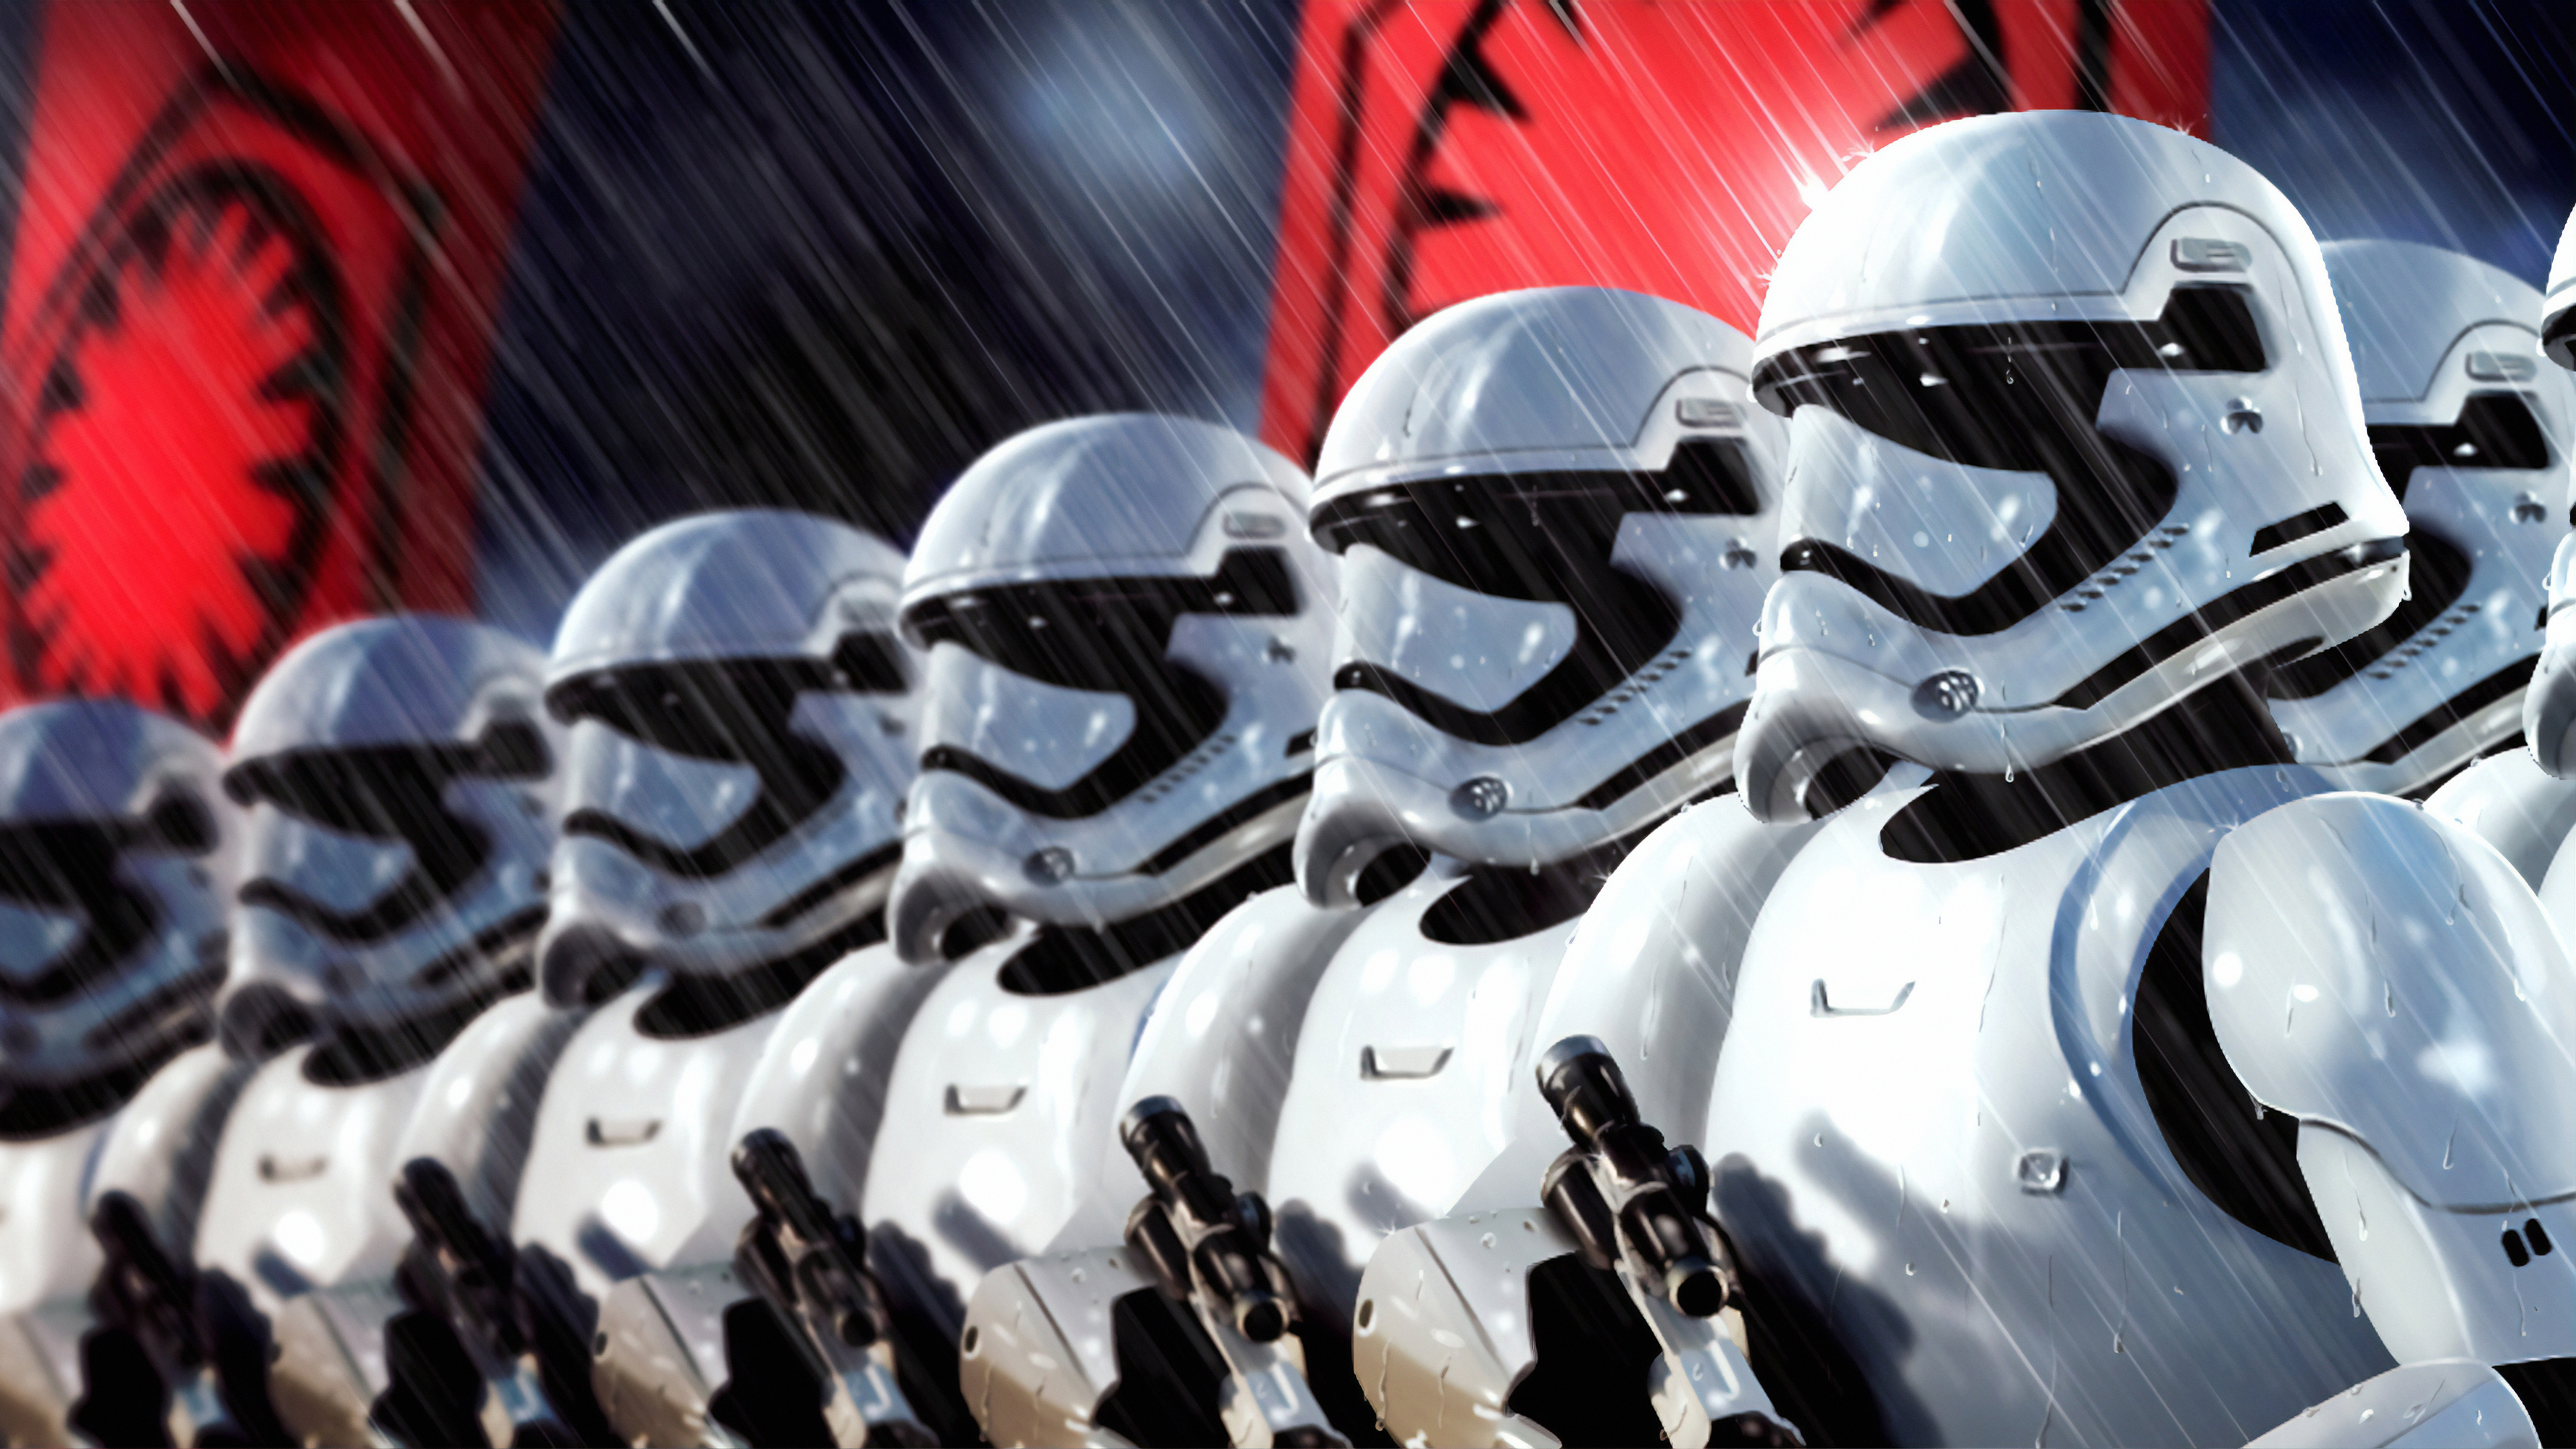 Wallpaper 4k Stormtroopers Art 4k Wallpapers Hd Wallpapers Movies Wallpapers Star Wars Wallpapers Stormtrooper Wallpapers